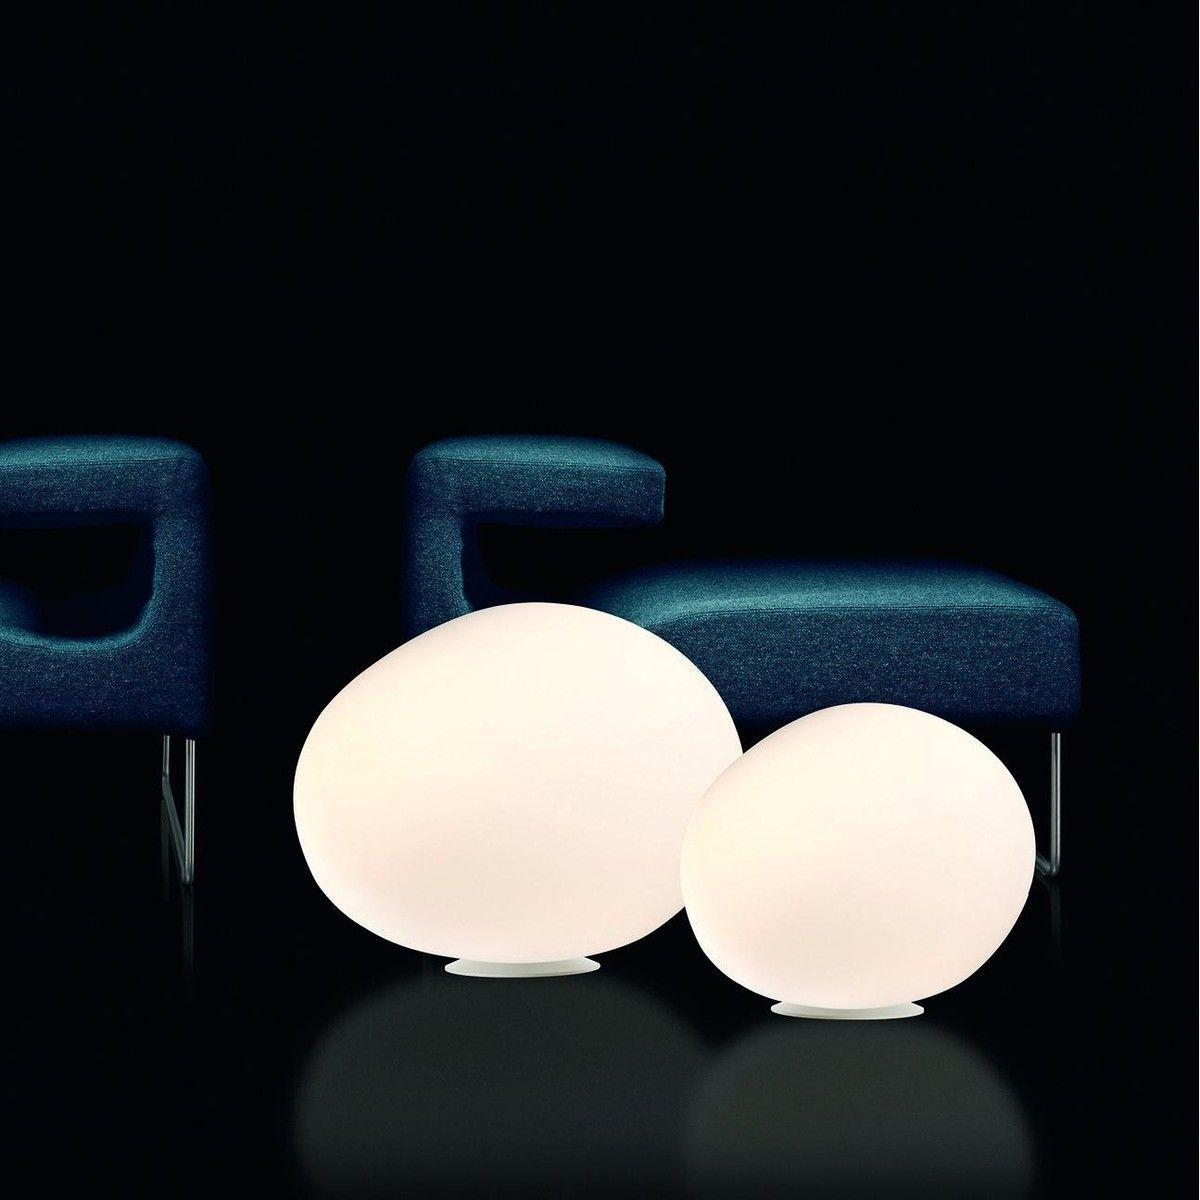 Glass pool table for sale - Gregg Table Lamp Floor Lamp Foscarini Ambientedirect Com